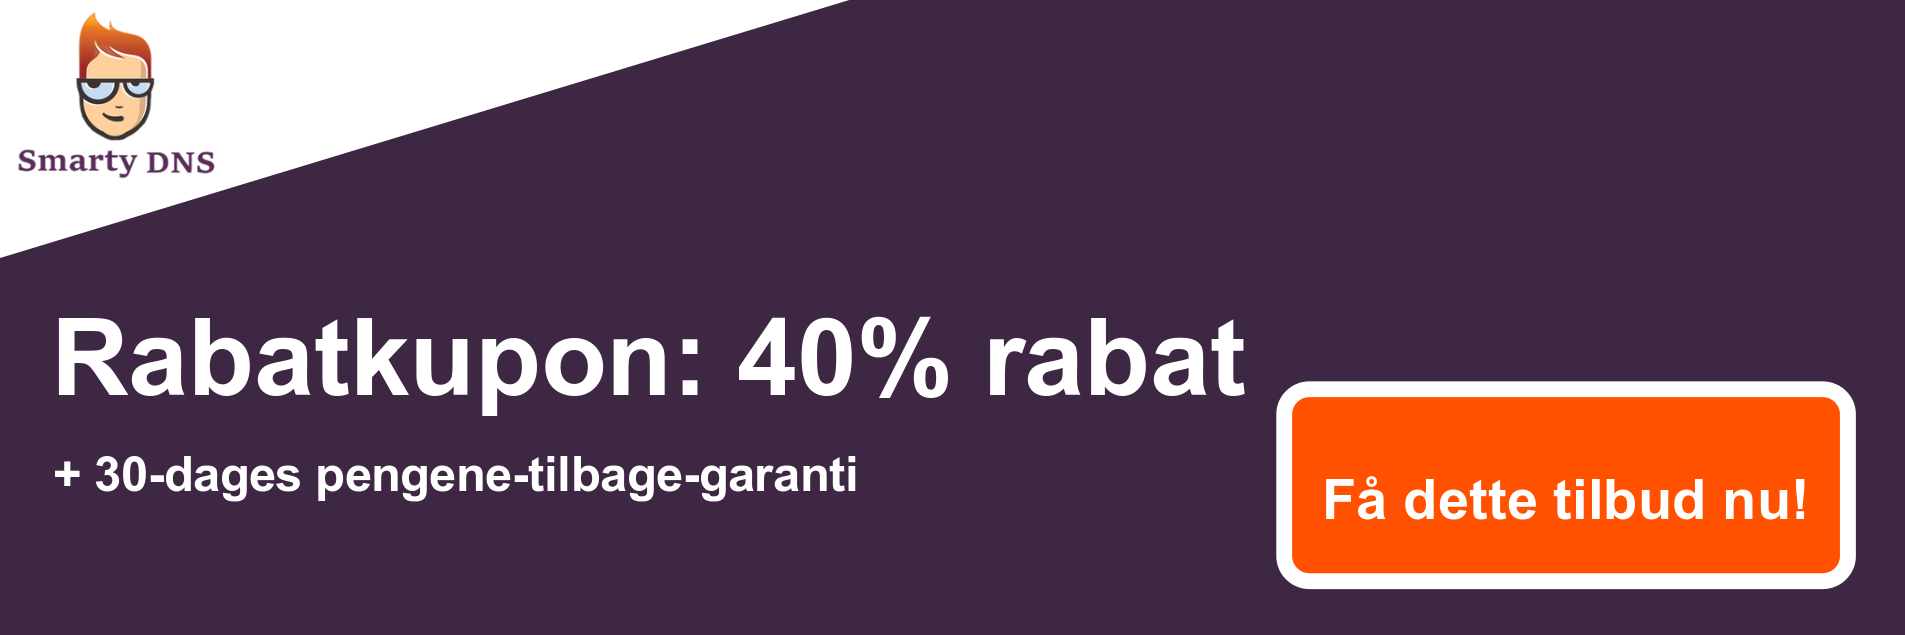 SmartyDNS kuponbanner - 40% rabat